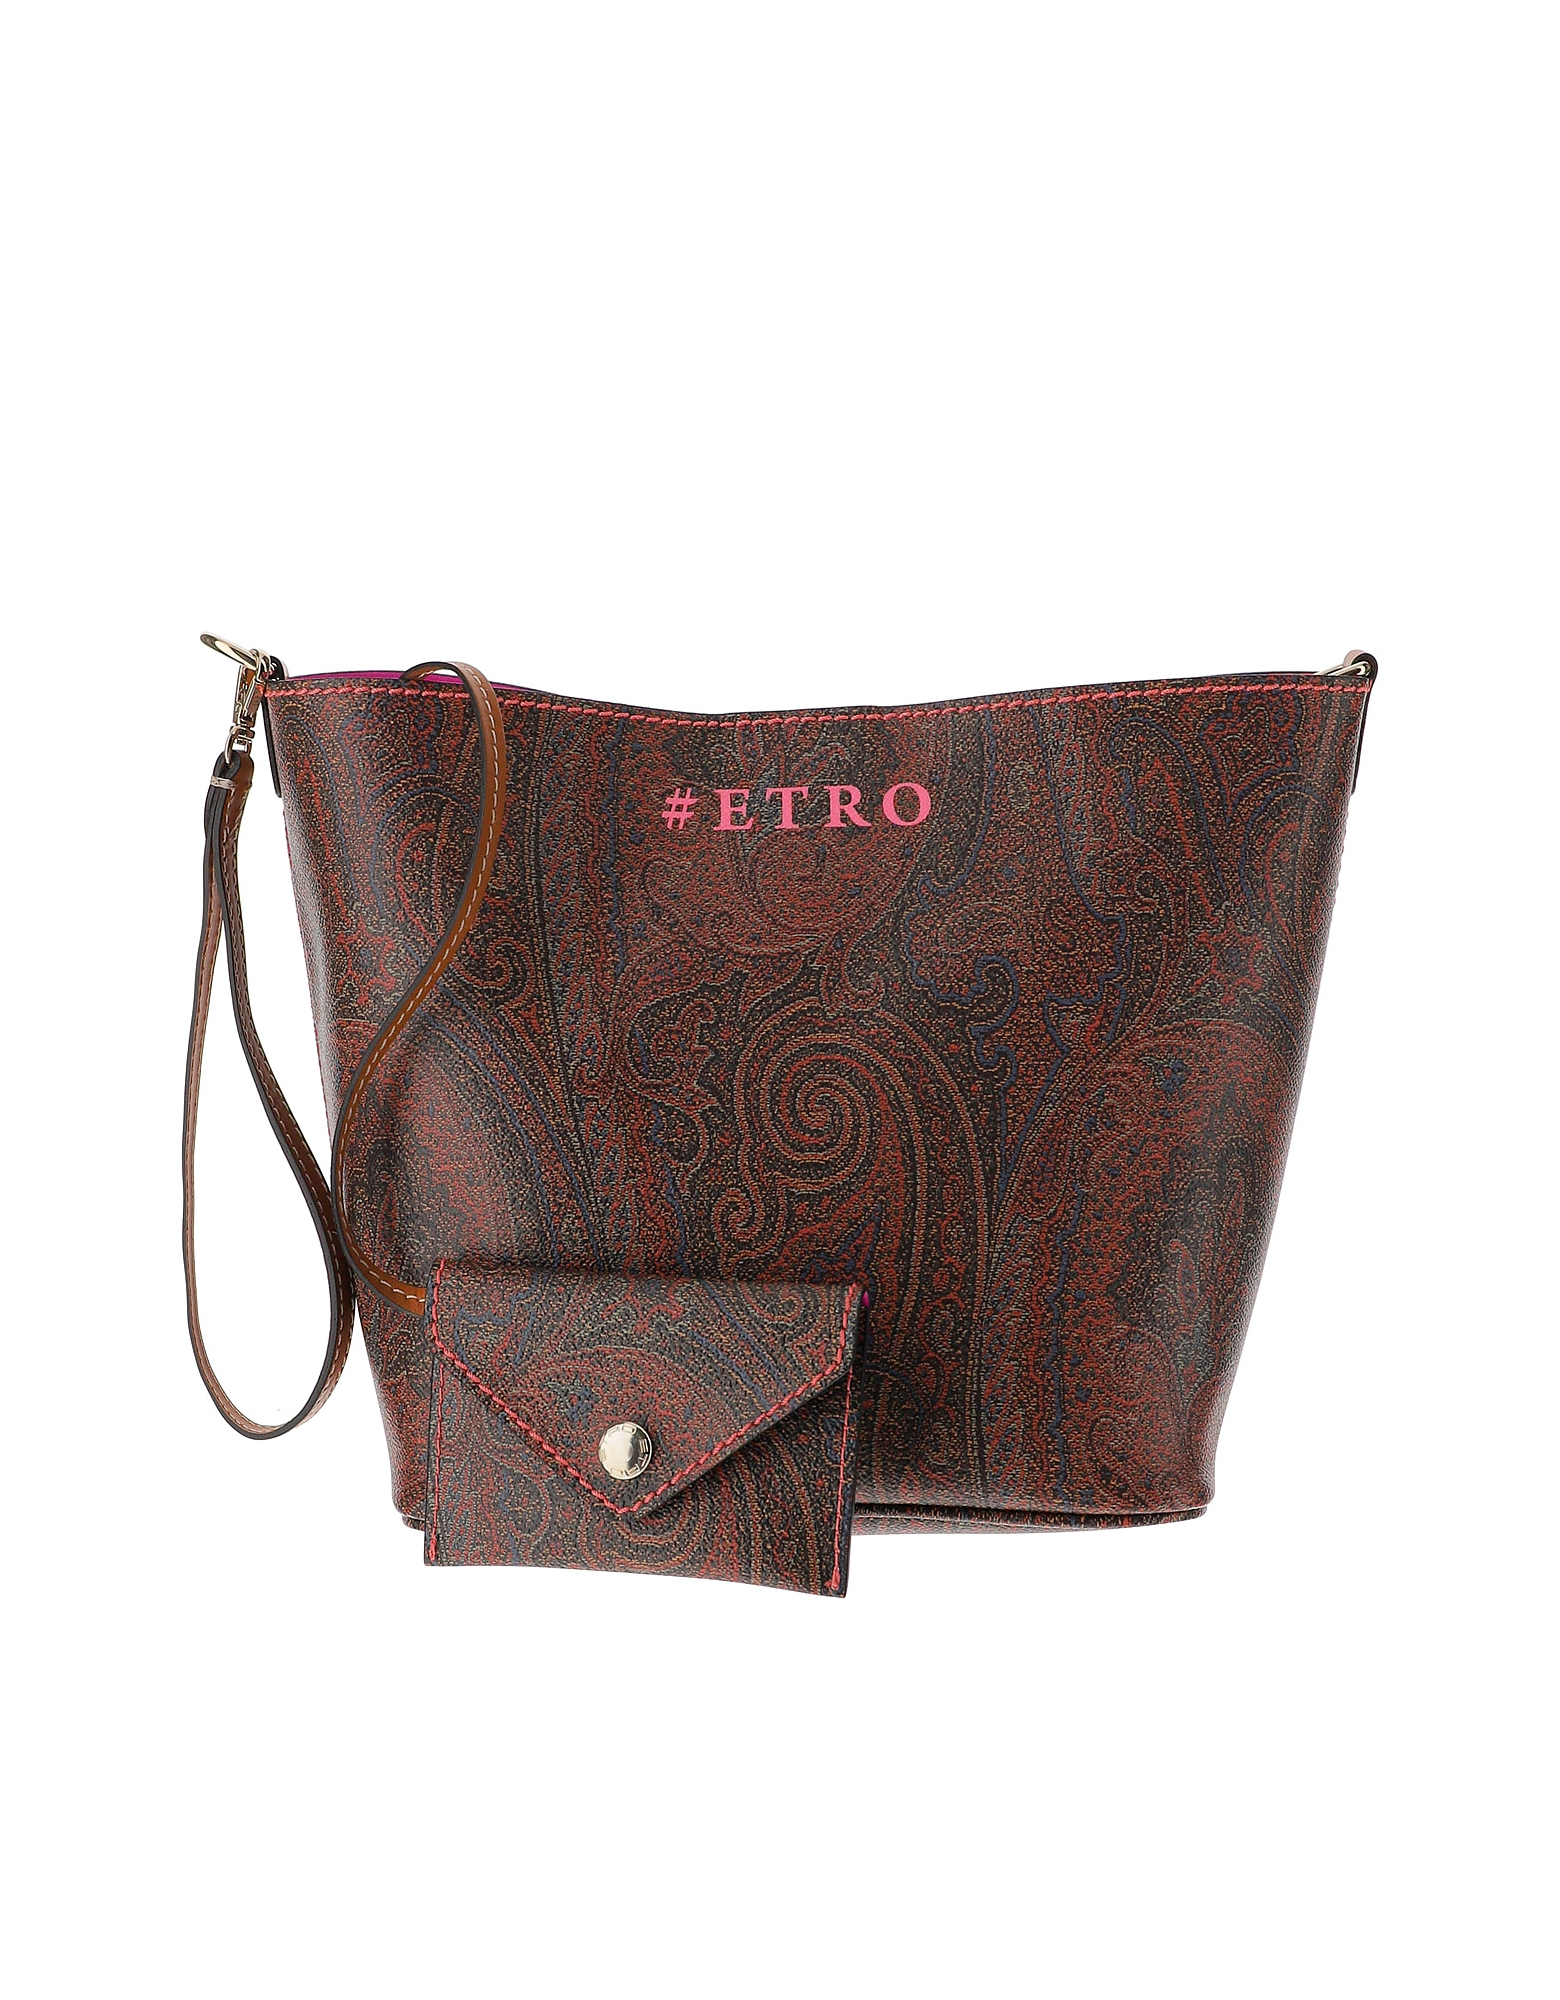 Etro Designer Handbags, Paisley Print Coated Canvas Shoulder Bag